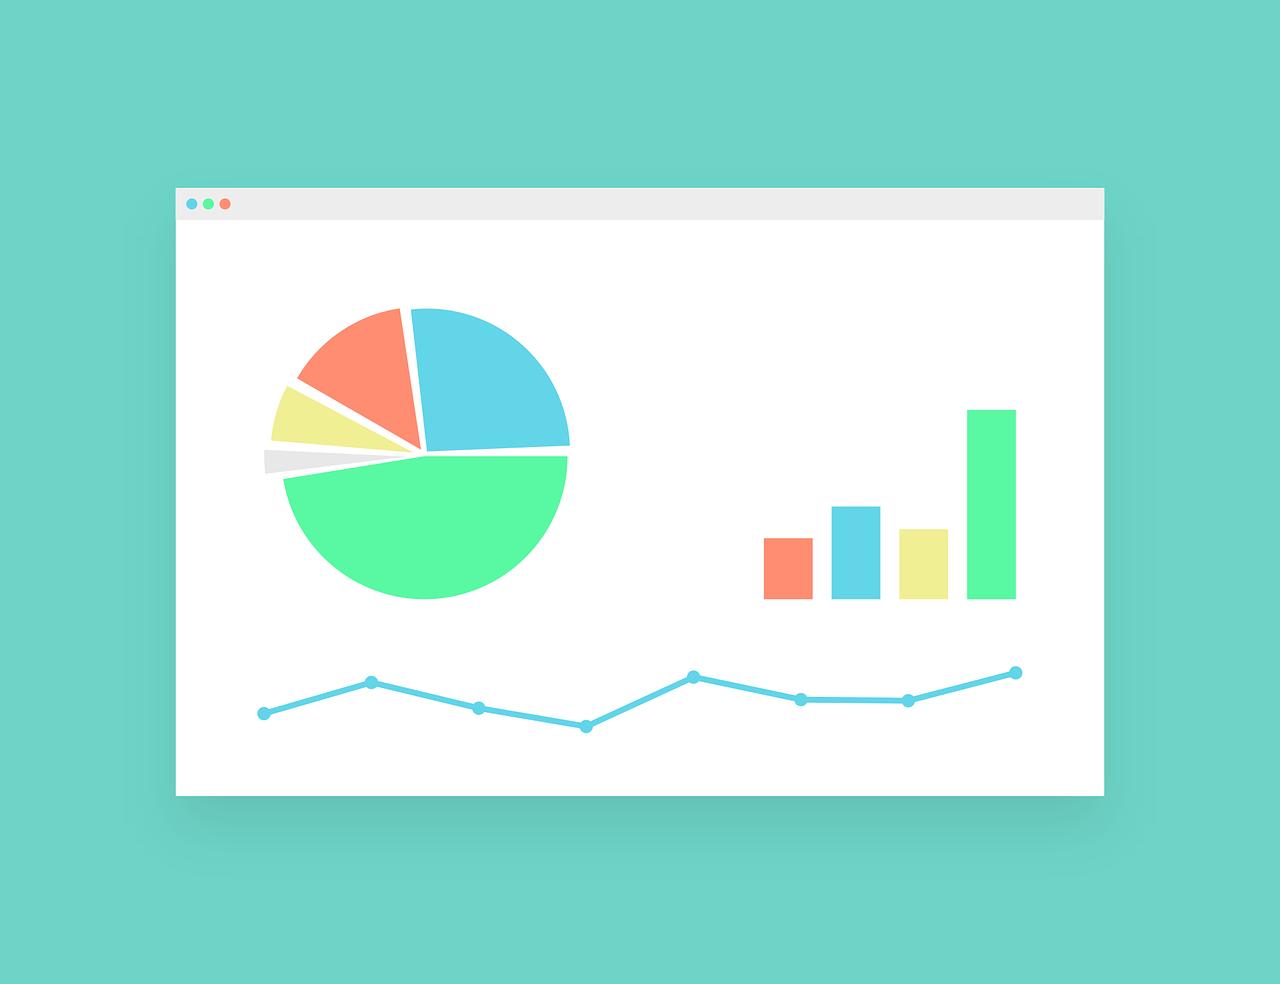 Predicting The Future: Regression Analysis Basics